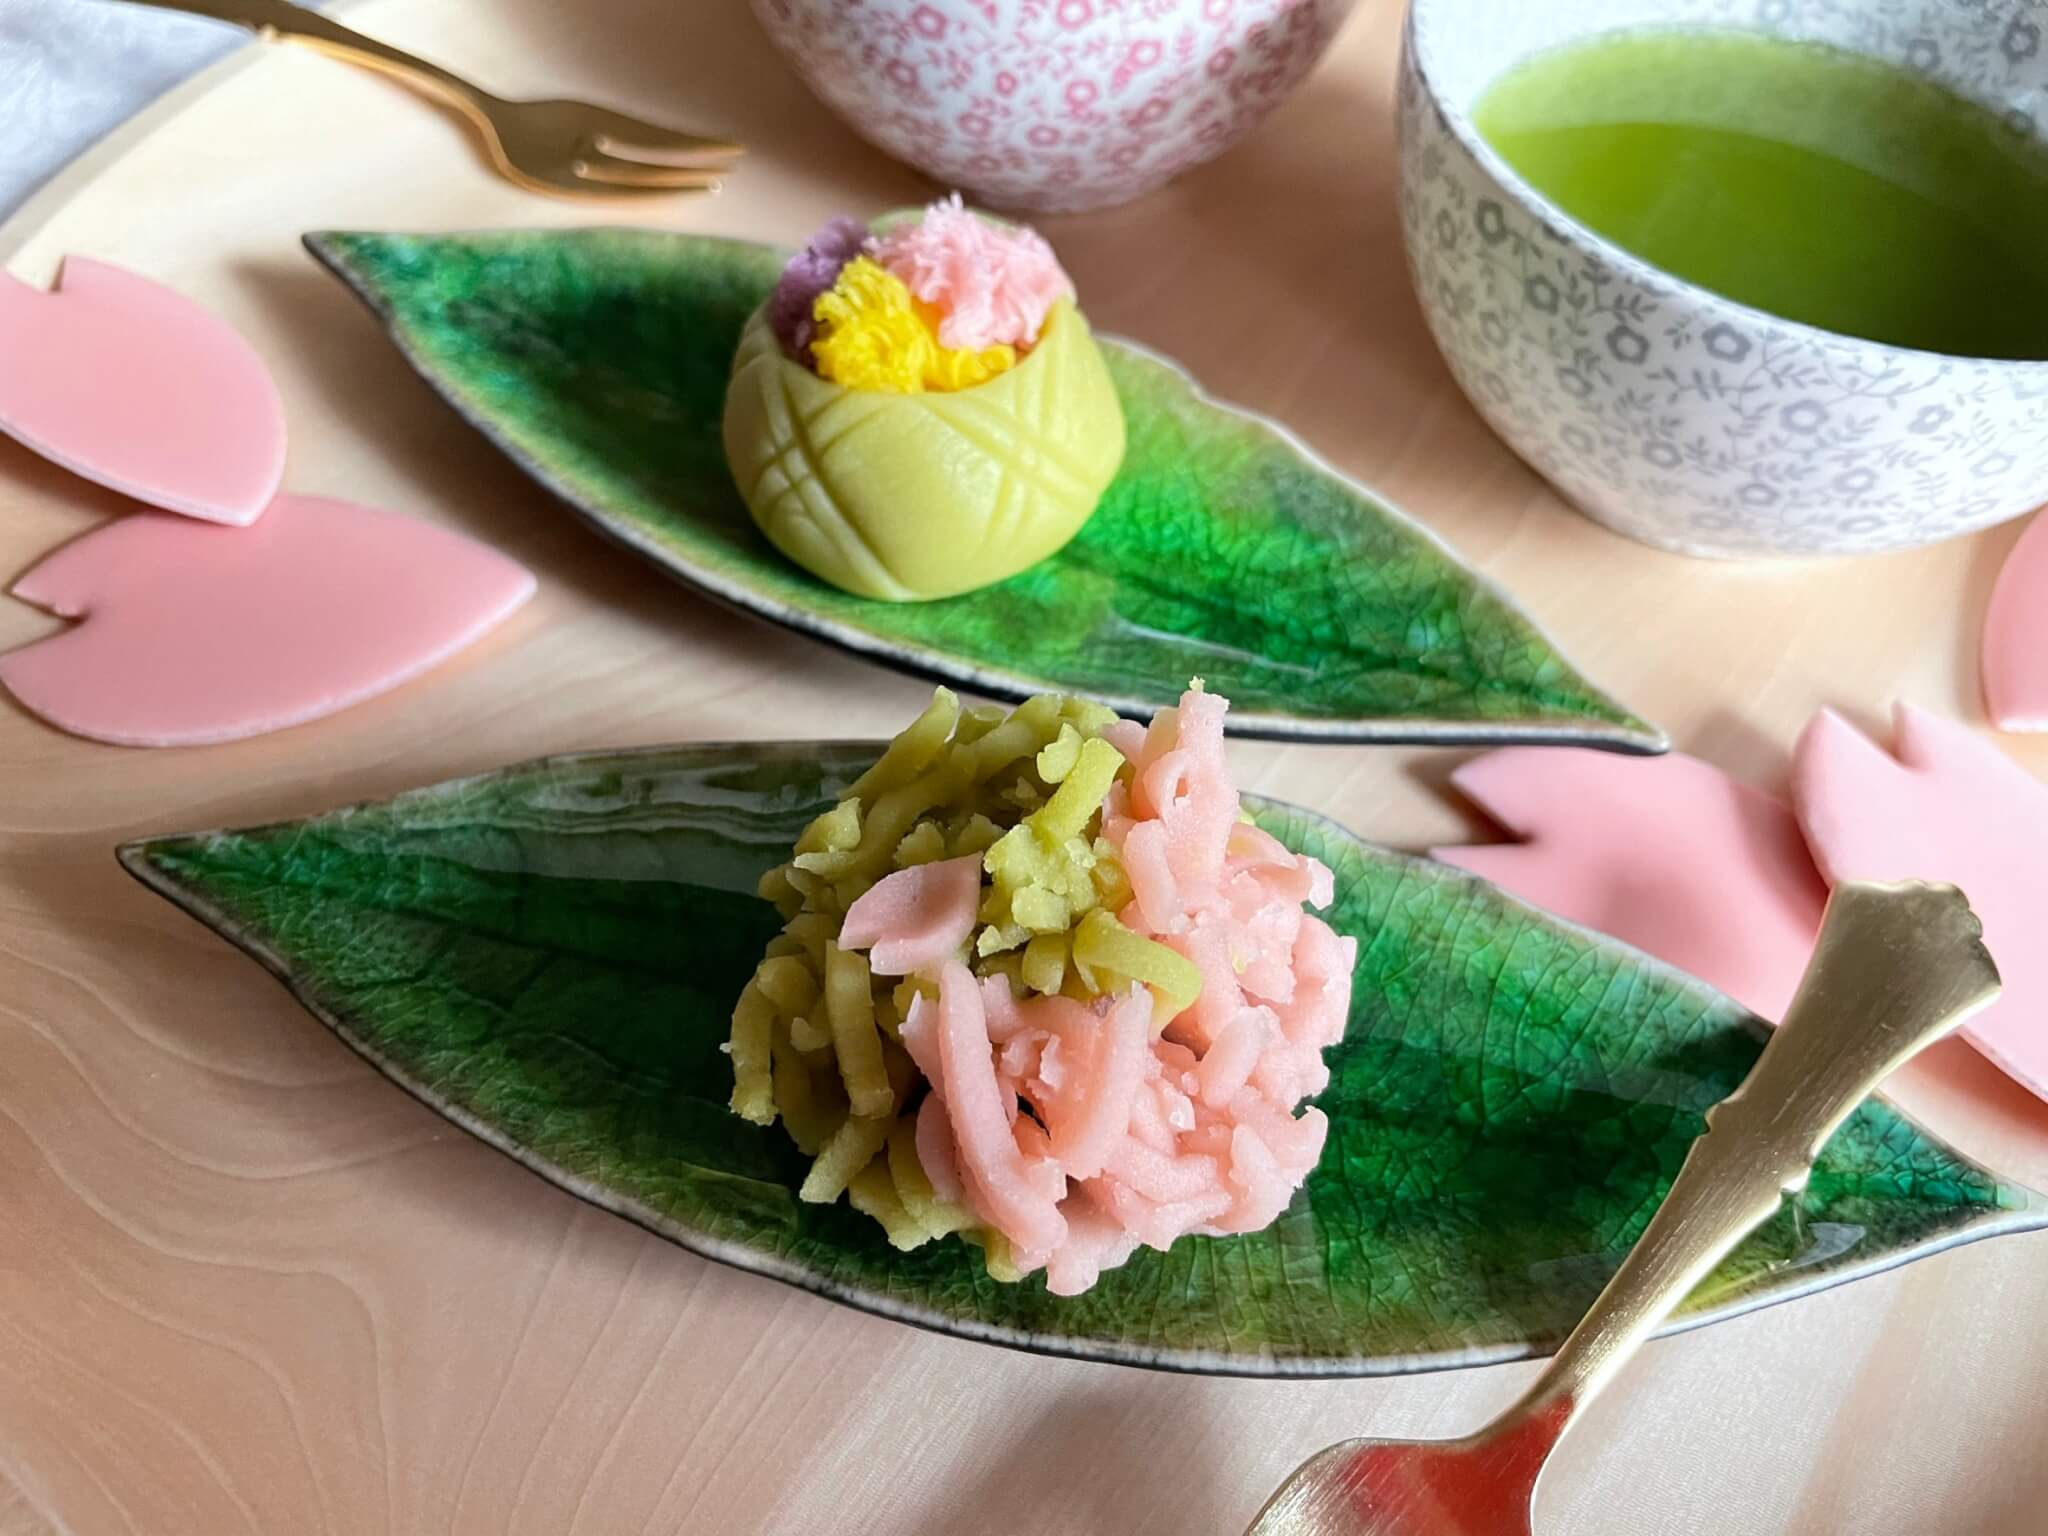 COSTA NOVA RIVIERA Laurel leaf Small plate 和菓子にも合うローレルリーフの小皿